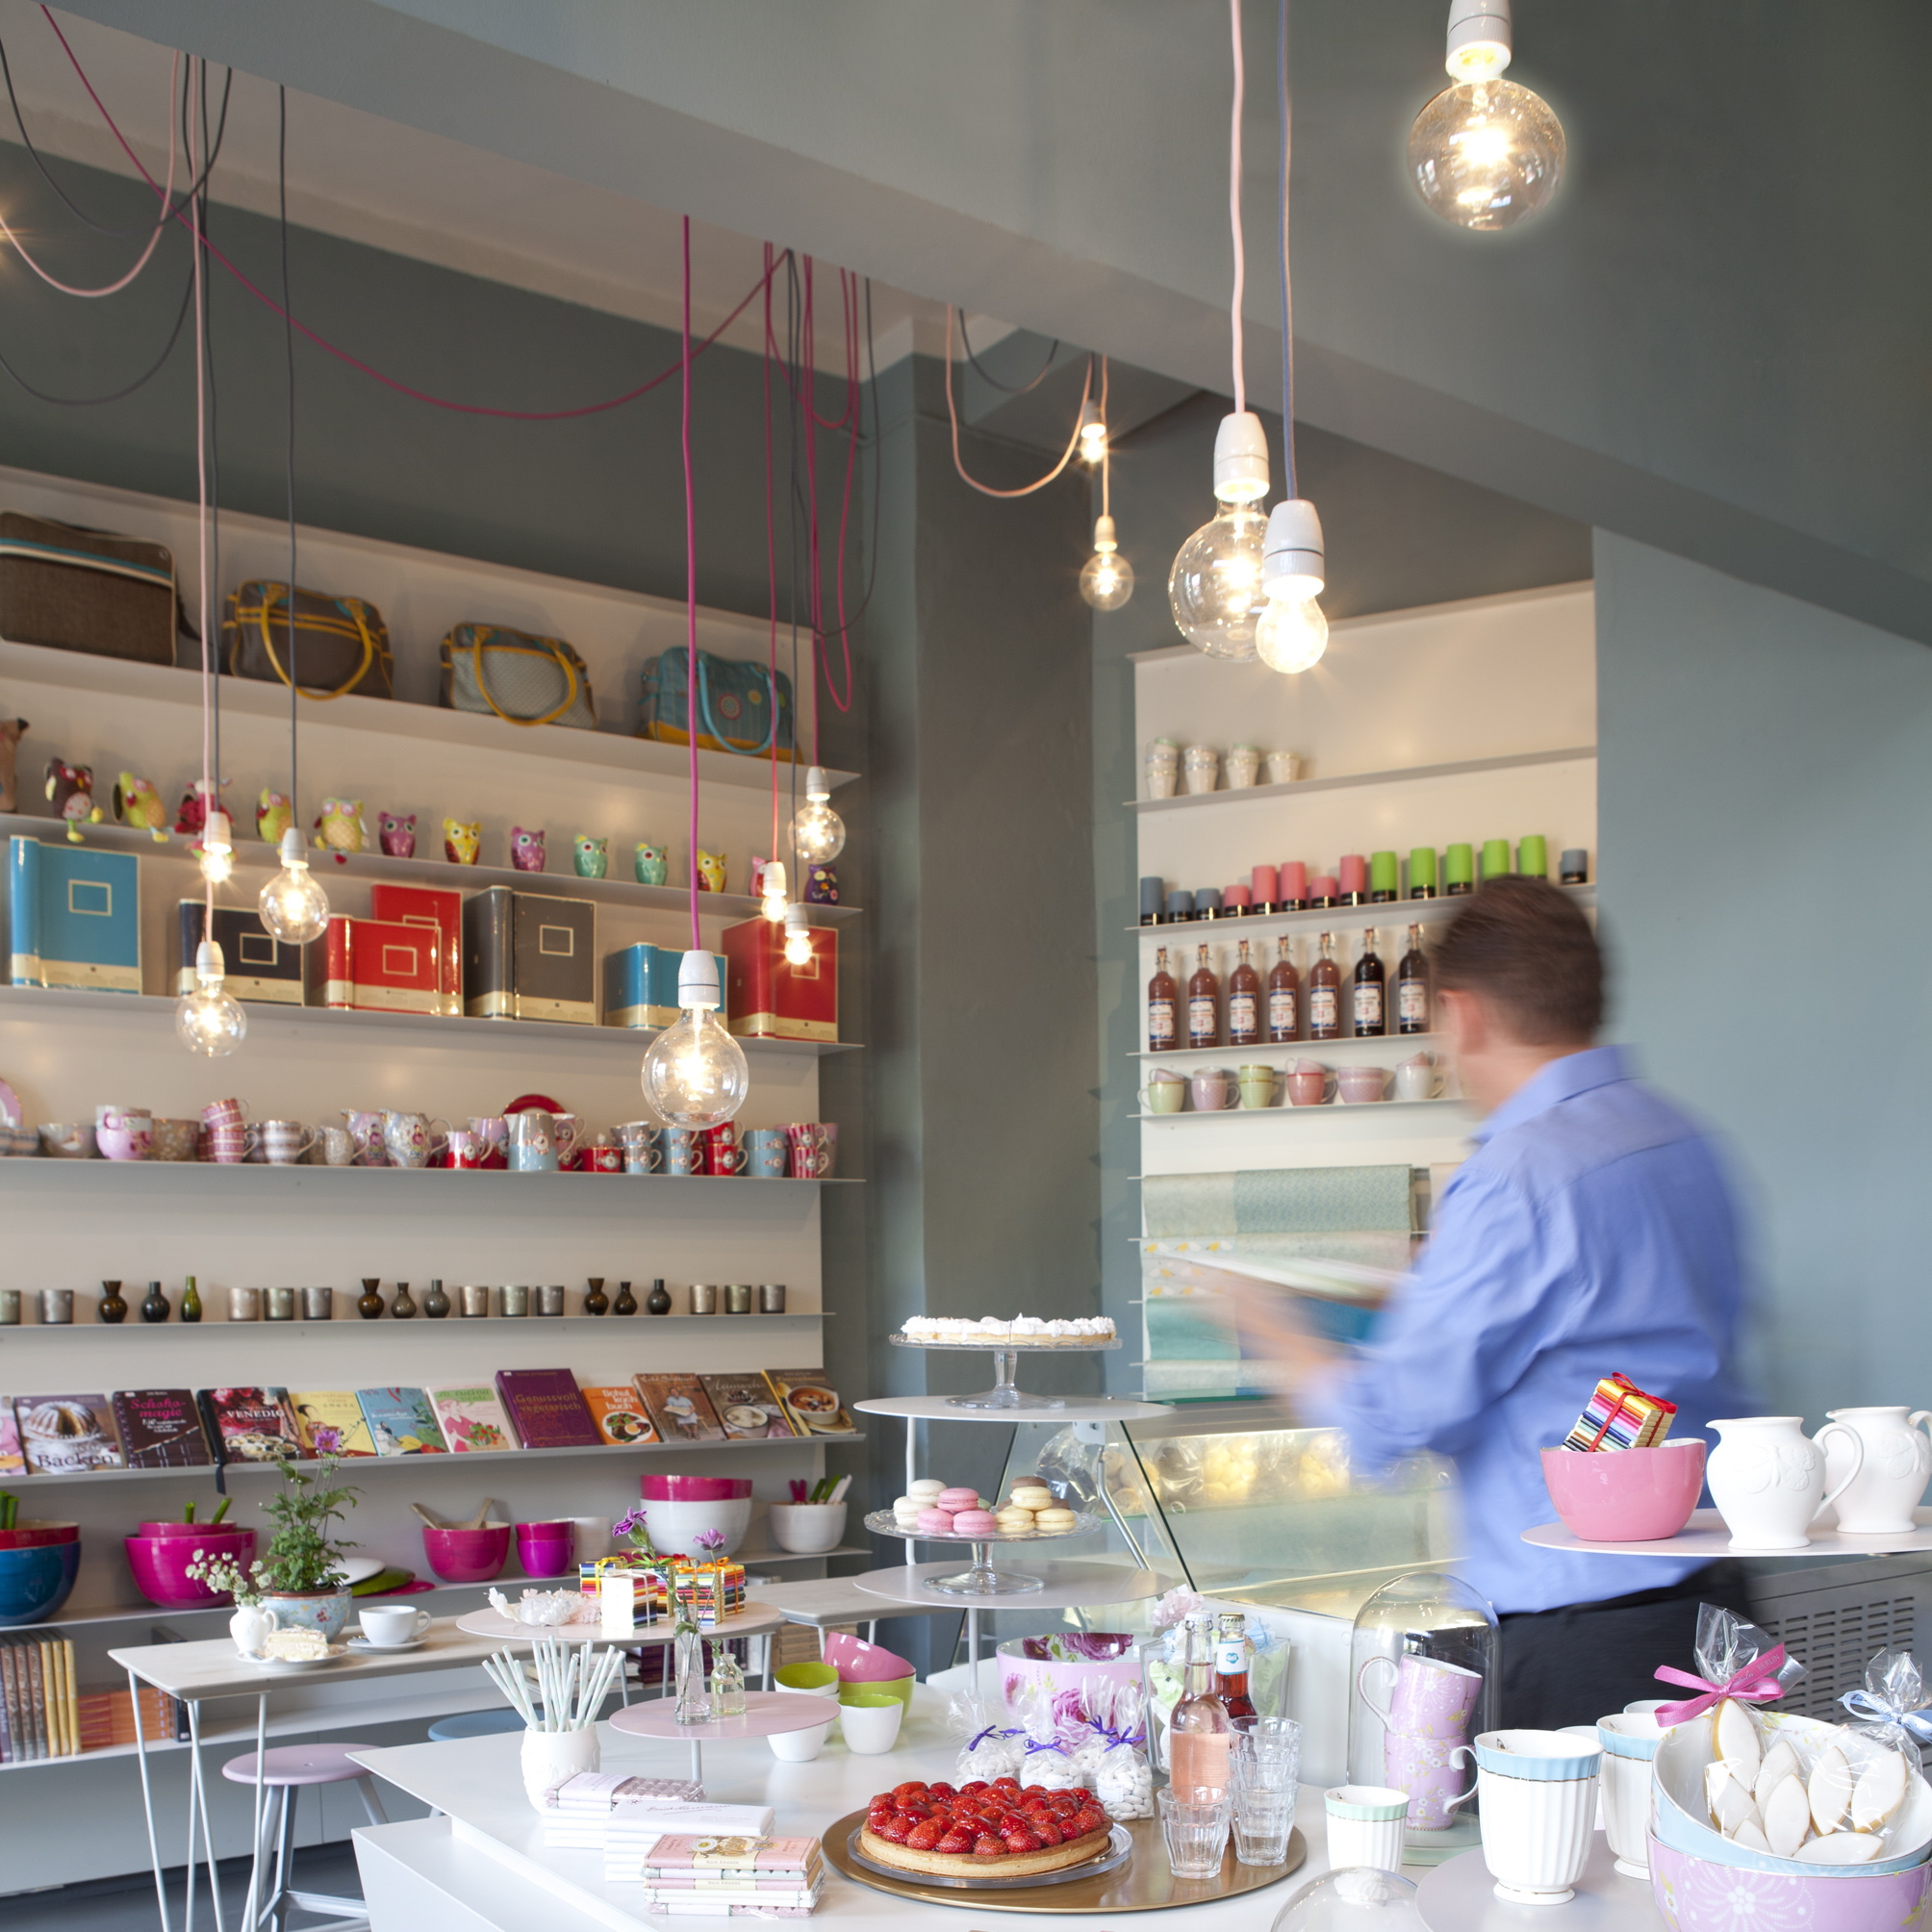 Suesskramdealer-Berlin-Cafe-Friedenau-1